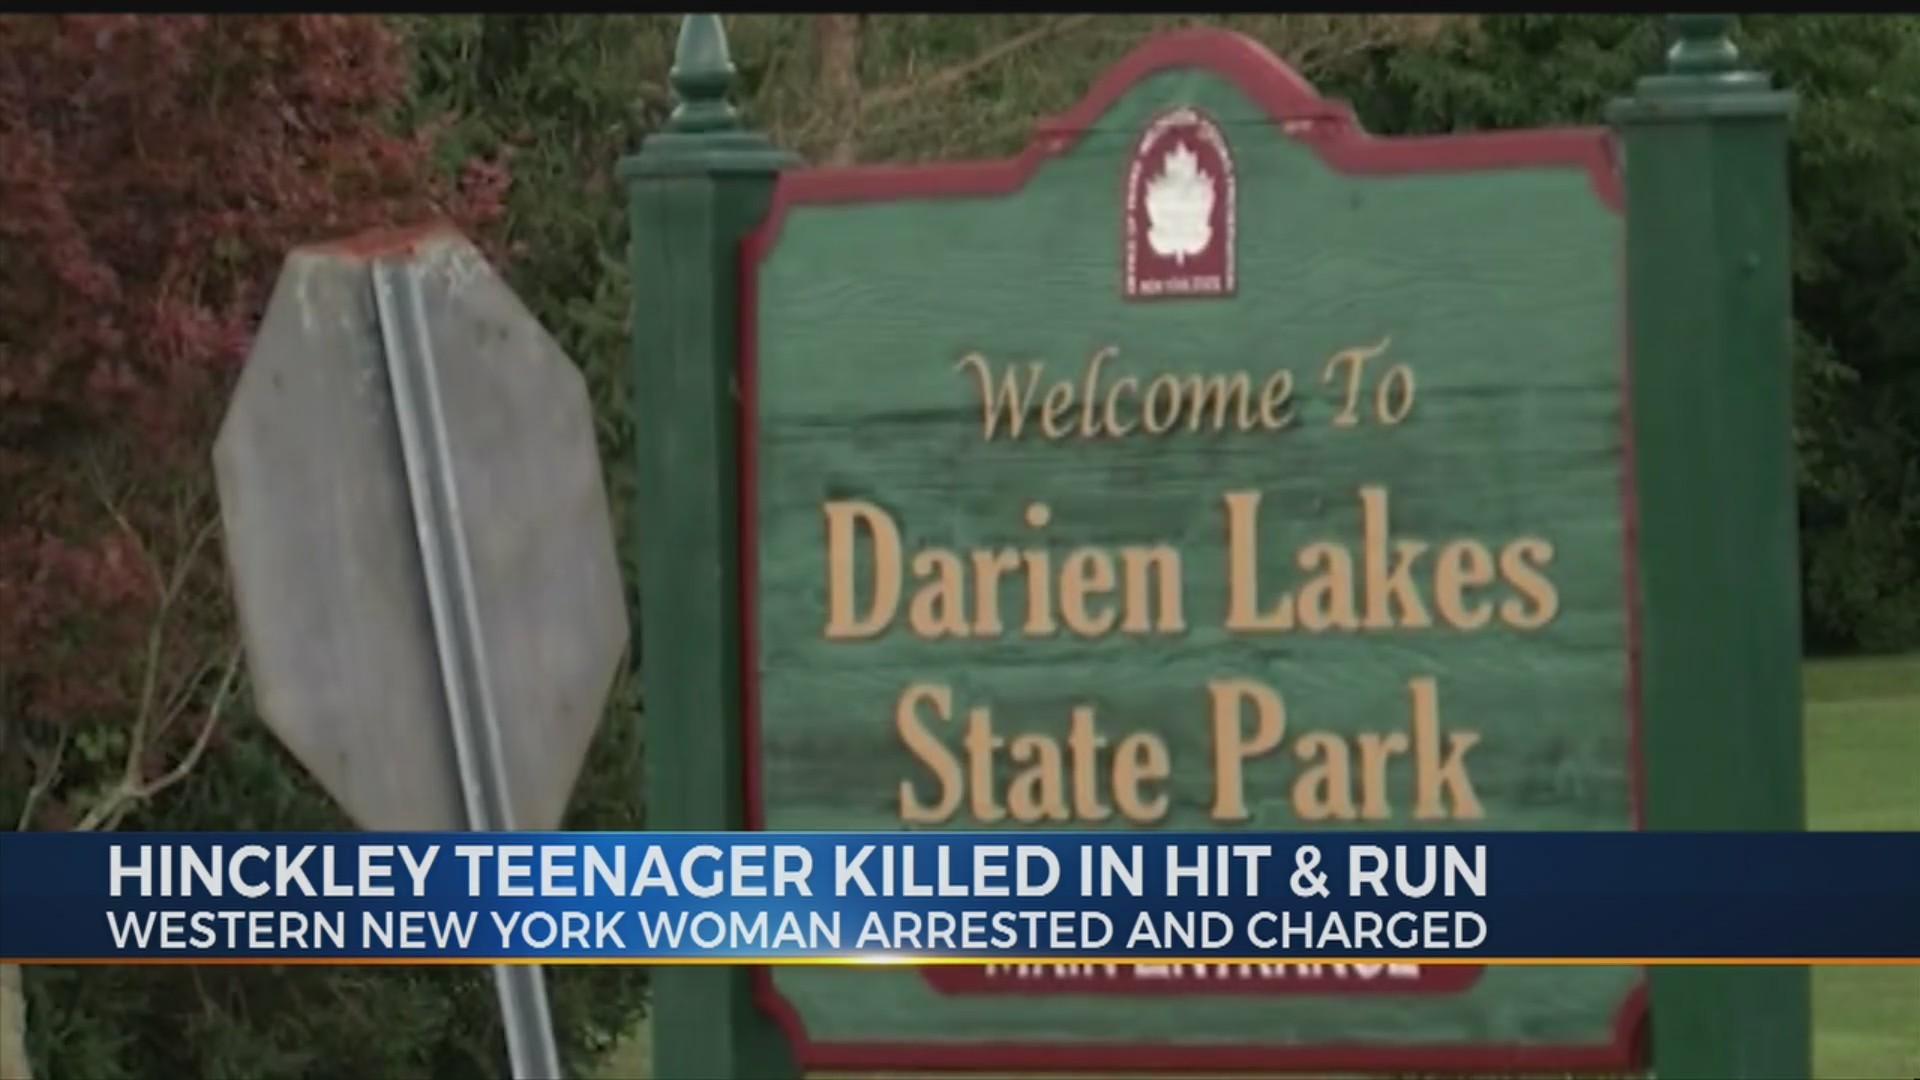 Hinckley_Teenage_Killed_in_Hit_and_Run_0_20180814131606